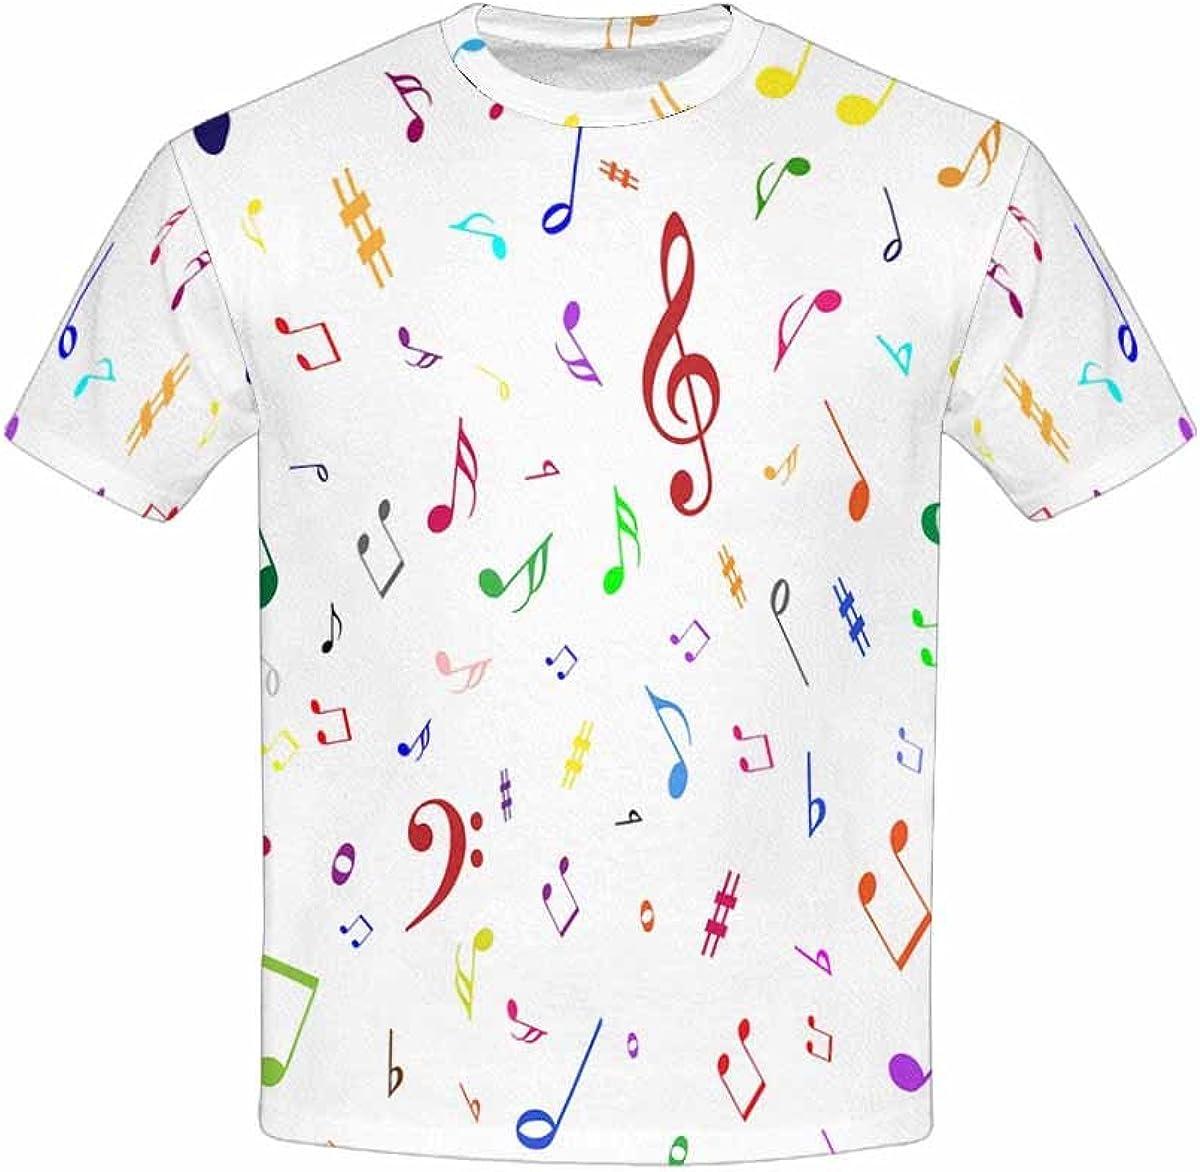 XS-XL INTERESTPRINT Music Notes Unisex Kids T-Shirts